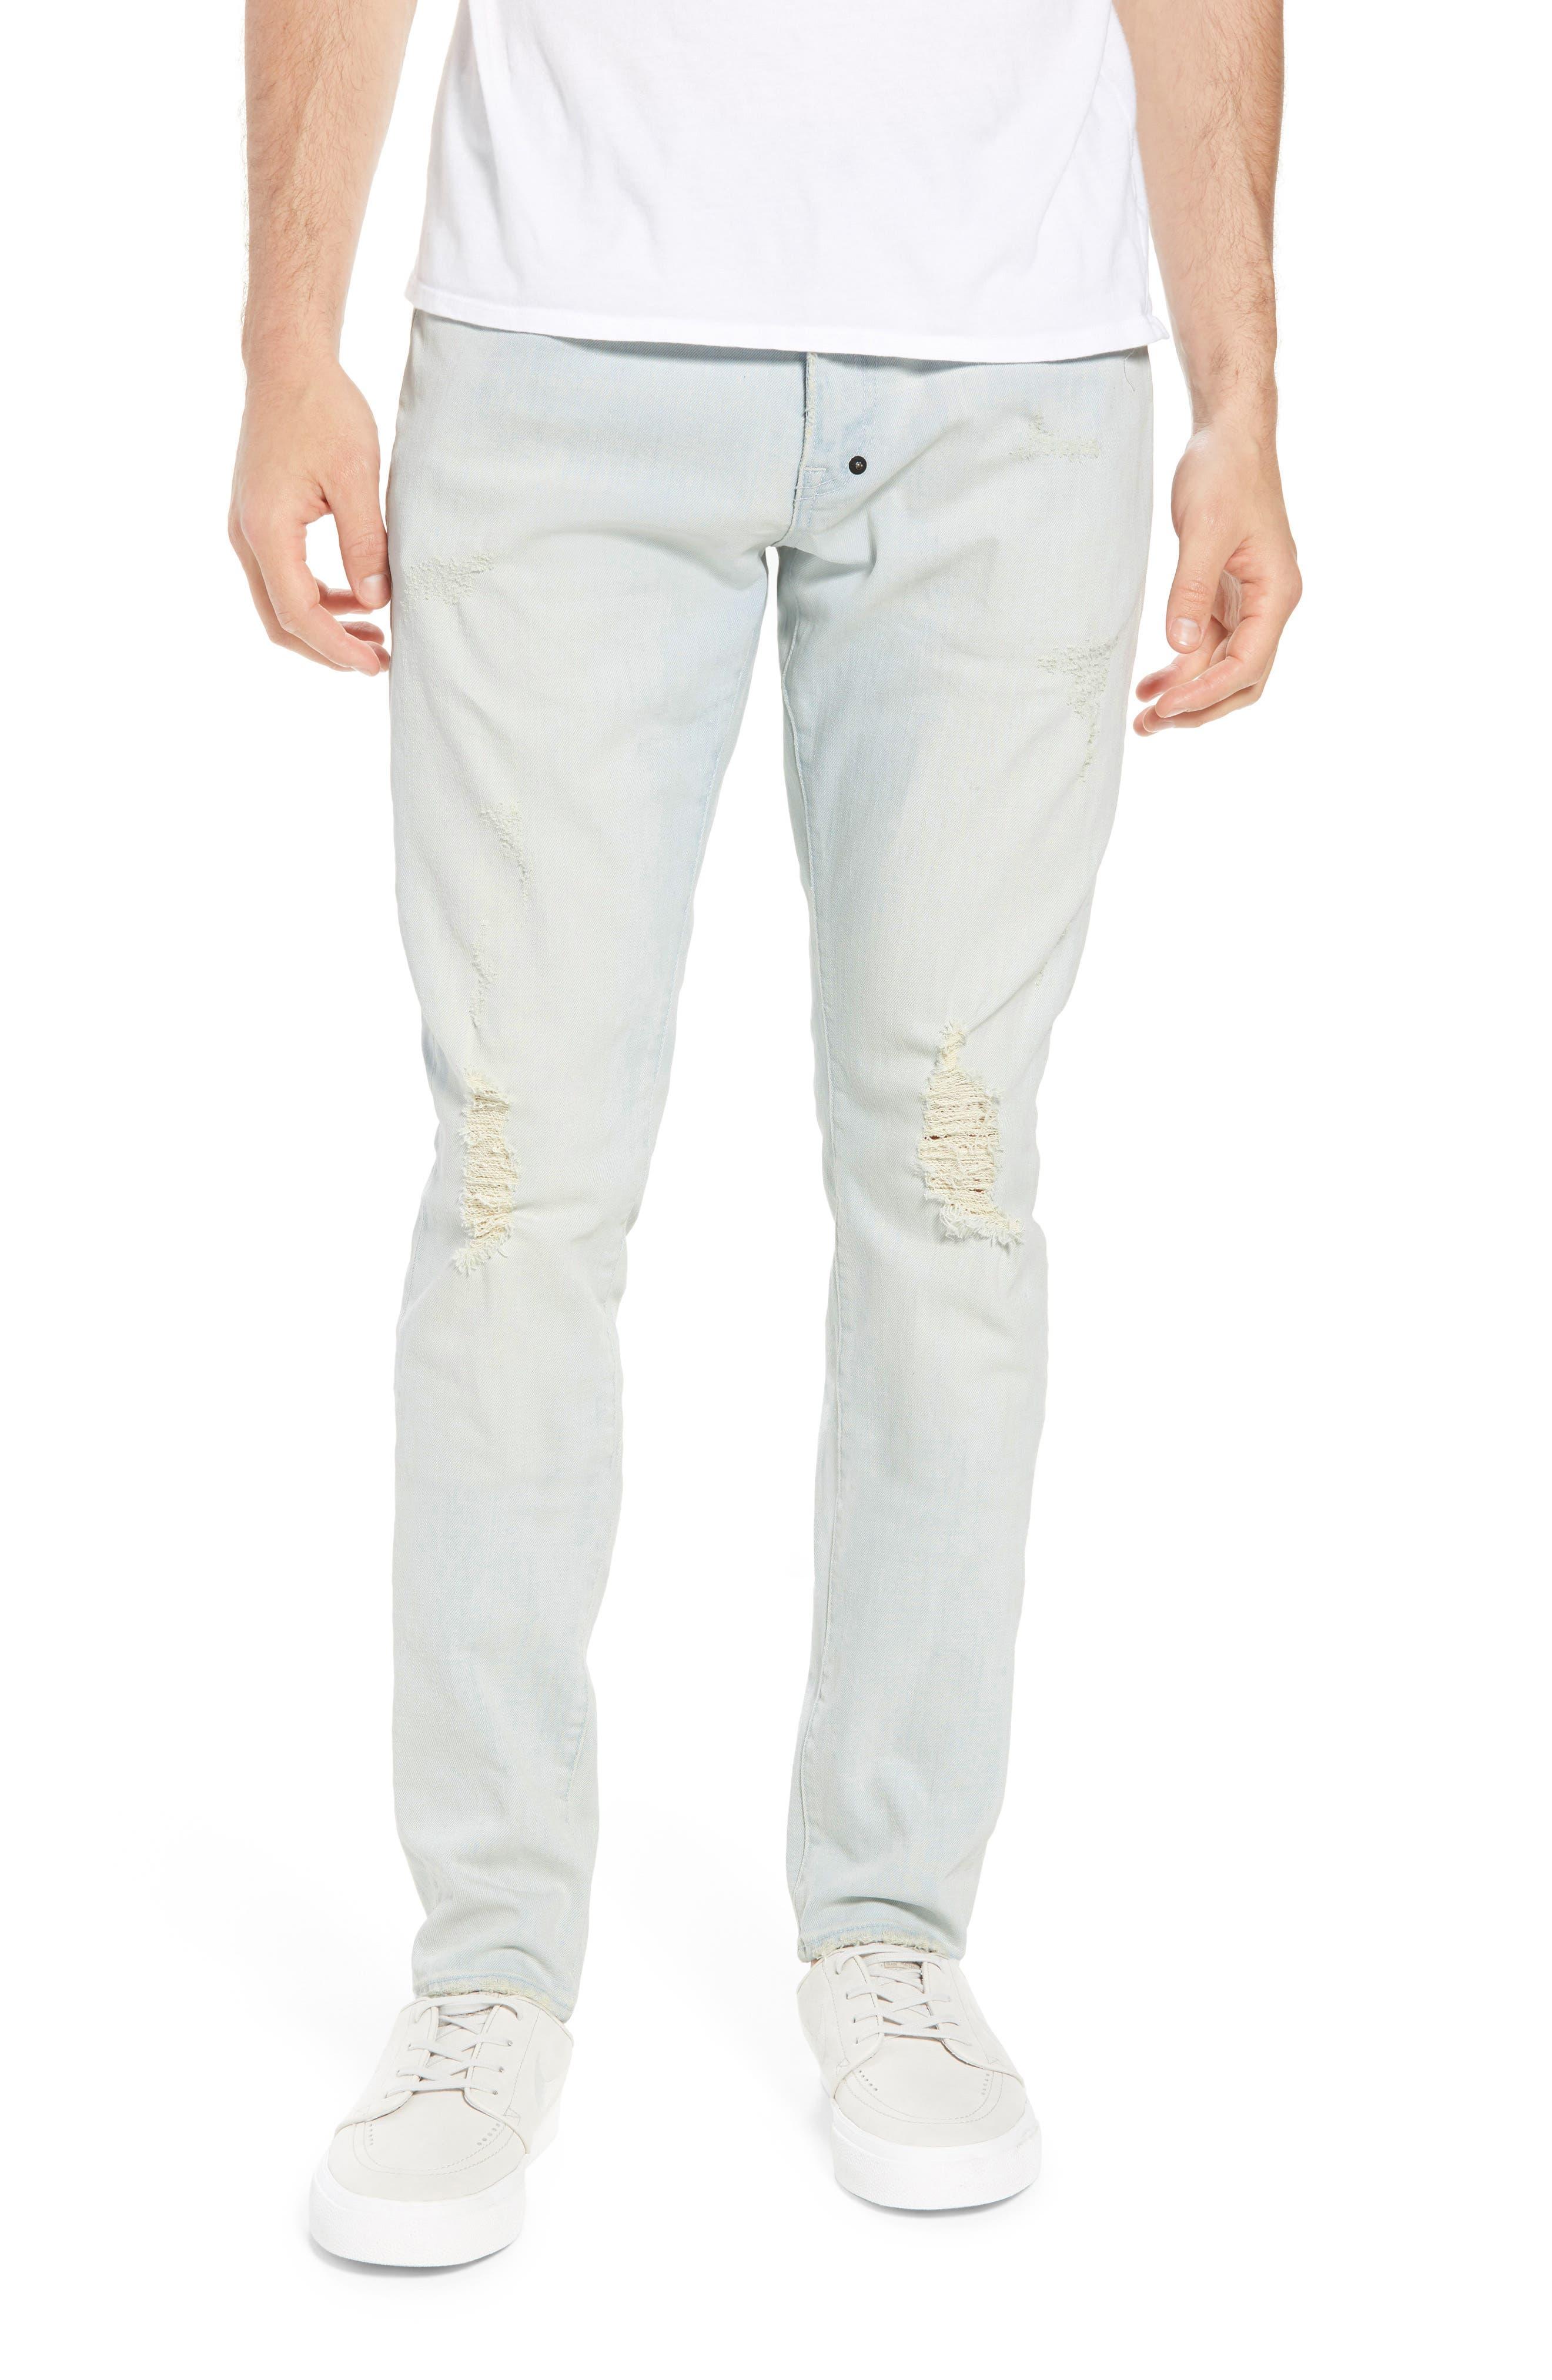 Windsor Slim Fit Jeans,                             Main thumbnail 1, color,                             Blue